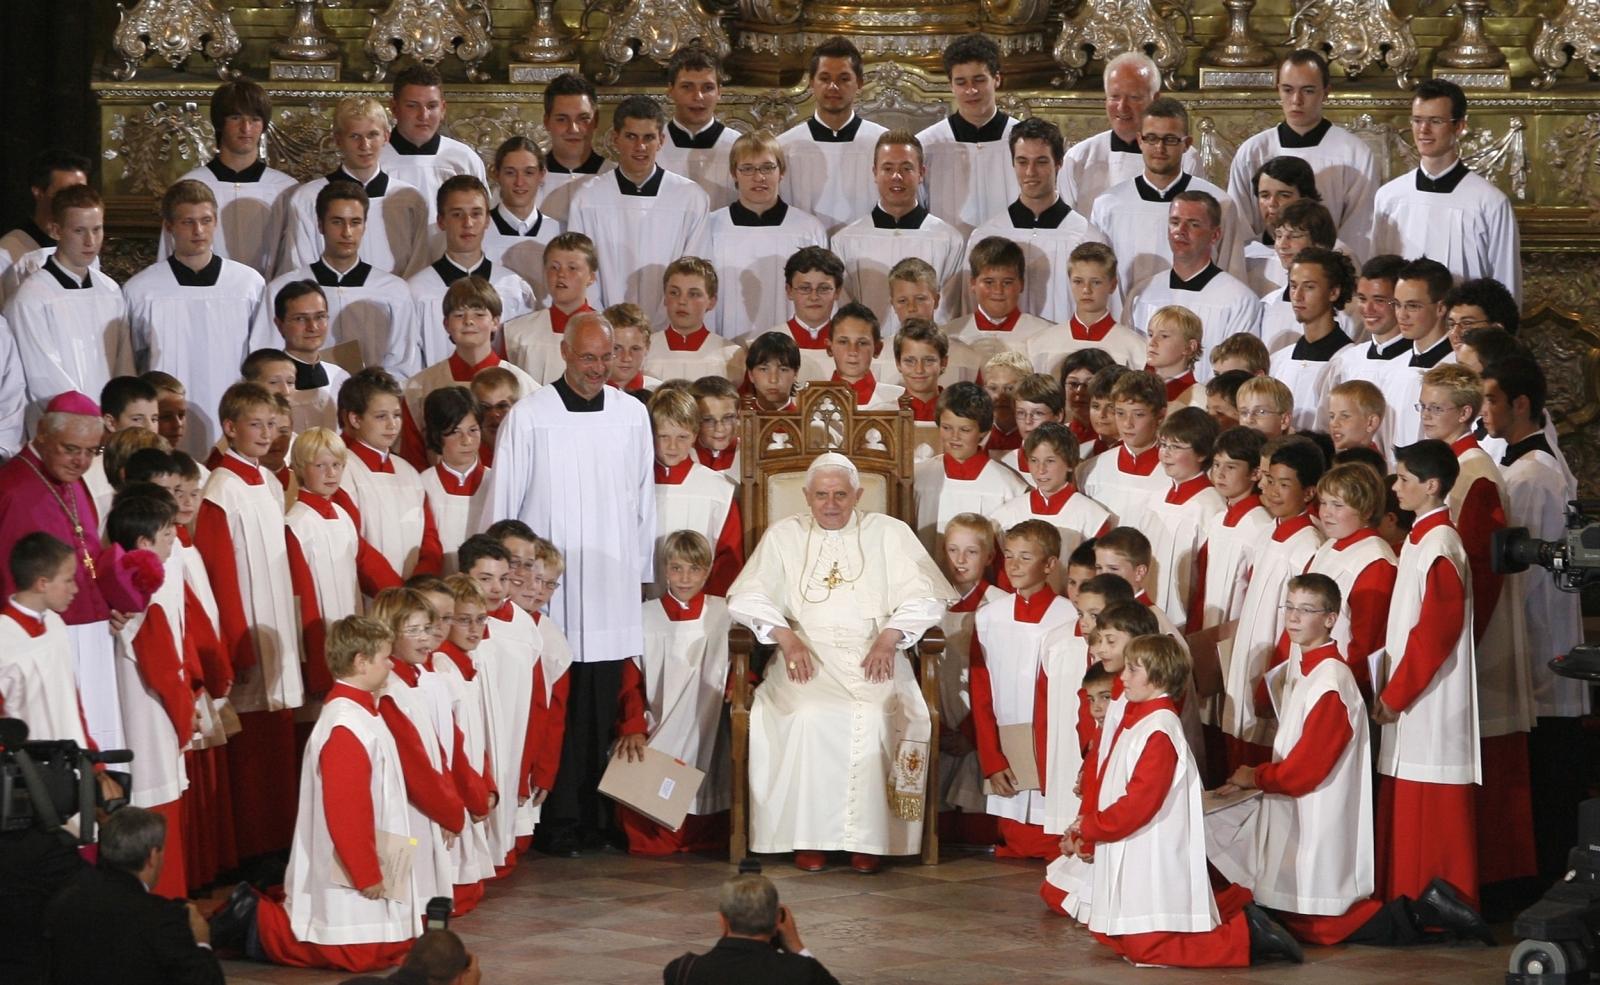 Regensburger Domspatzen choir